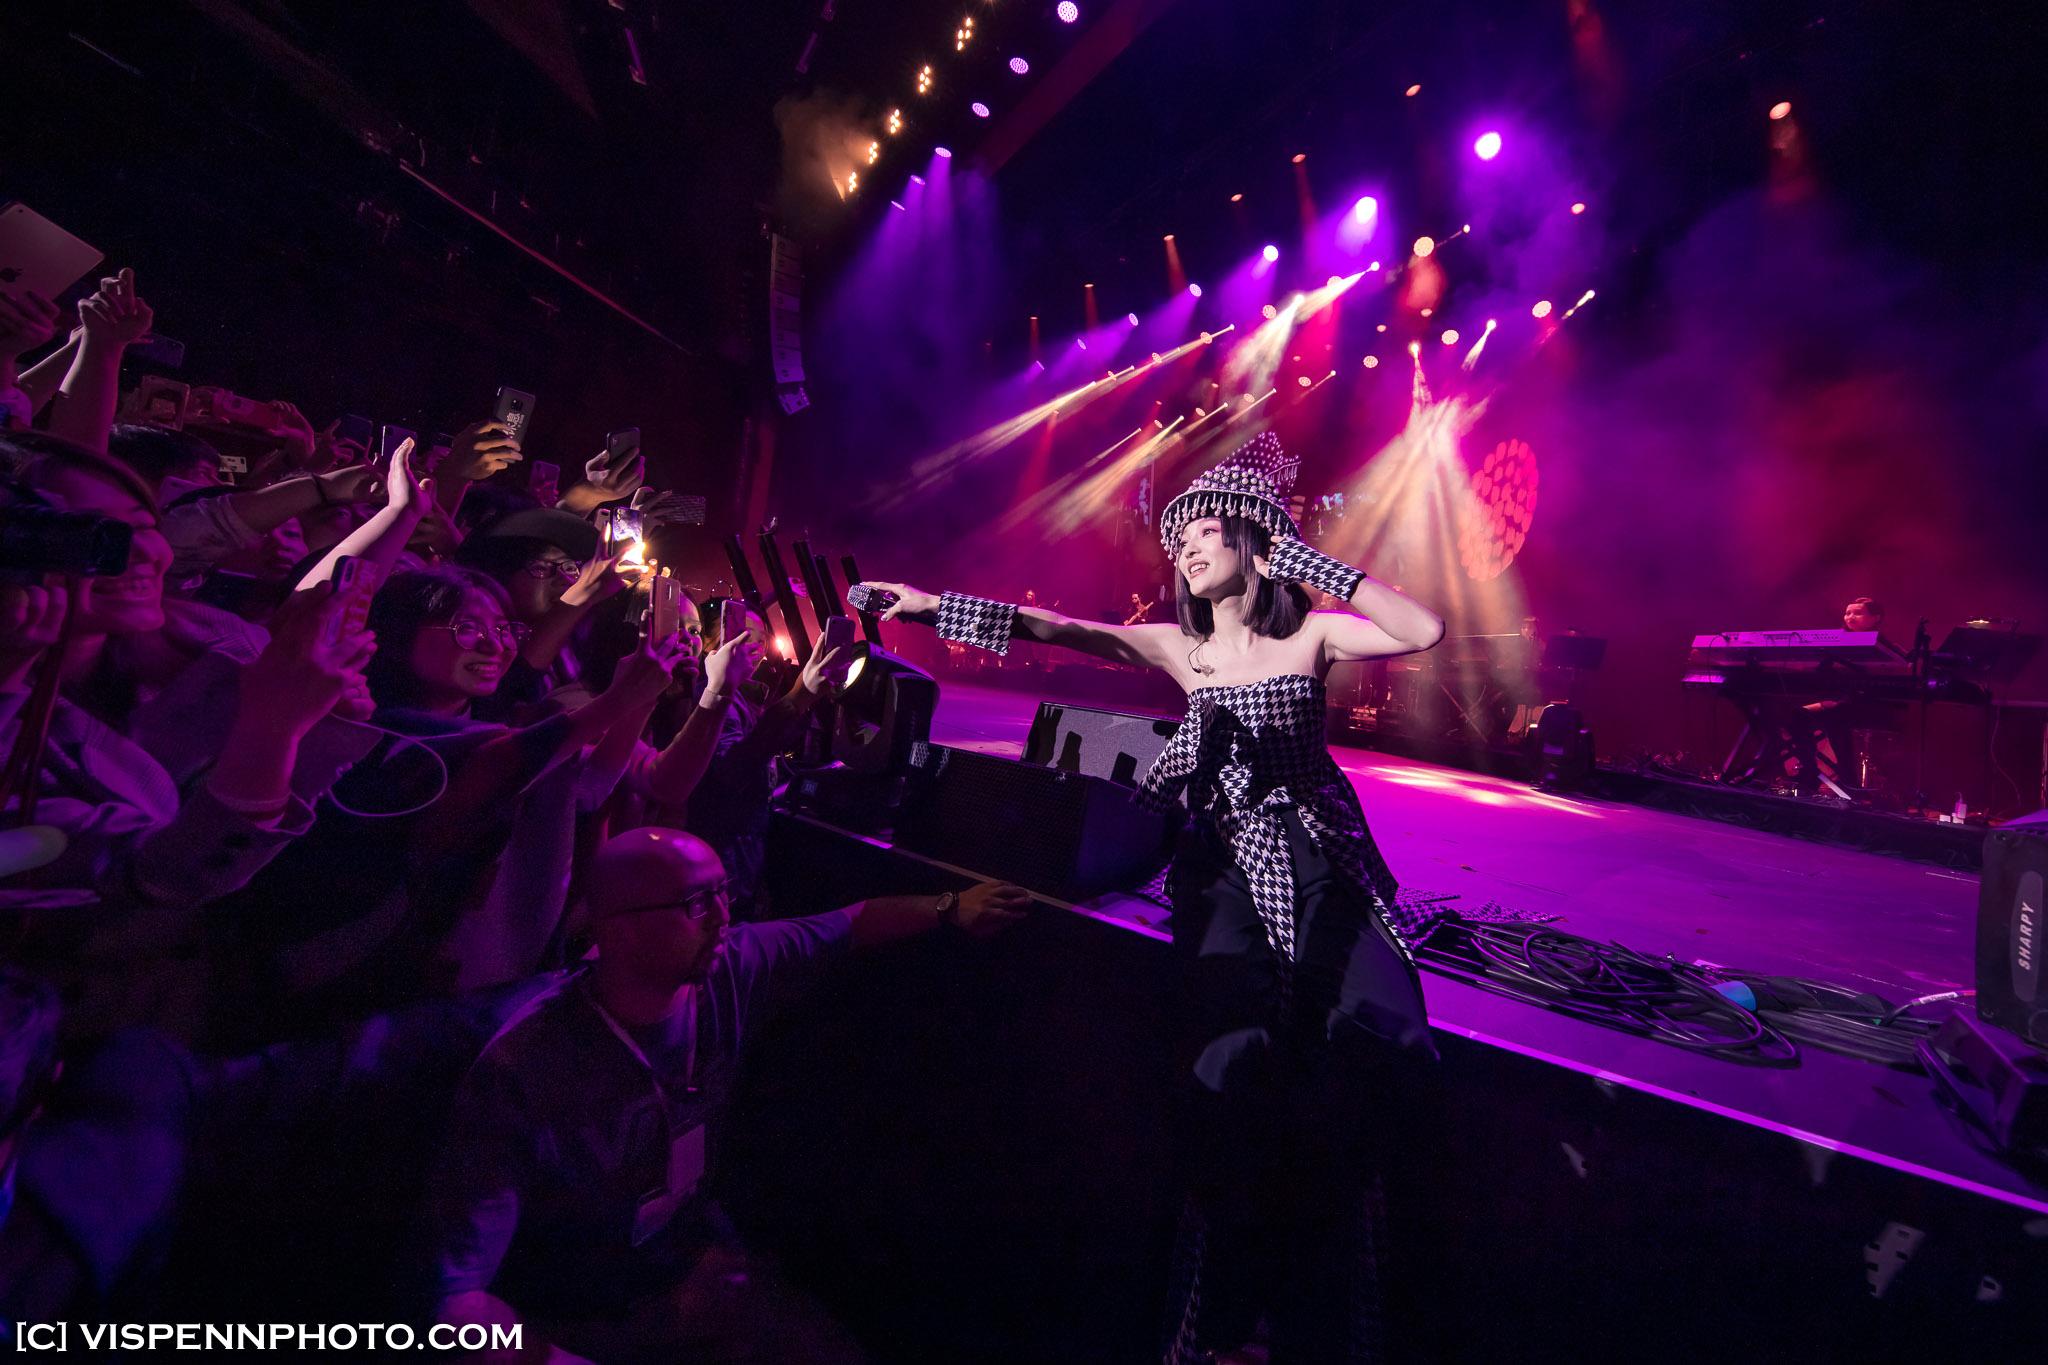 Melbourne CONCERTS Photography 墨尔本 演唱会 照片 摄影师 VISPENN AngelaZhang 2P 6032 5D4 VISPENN